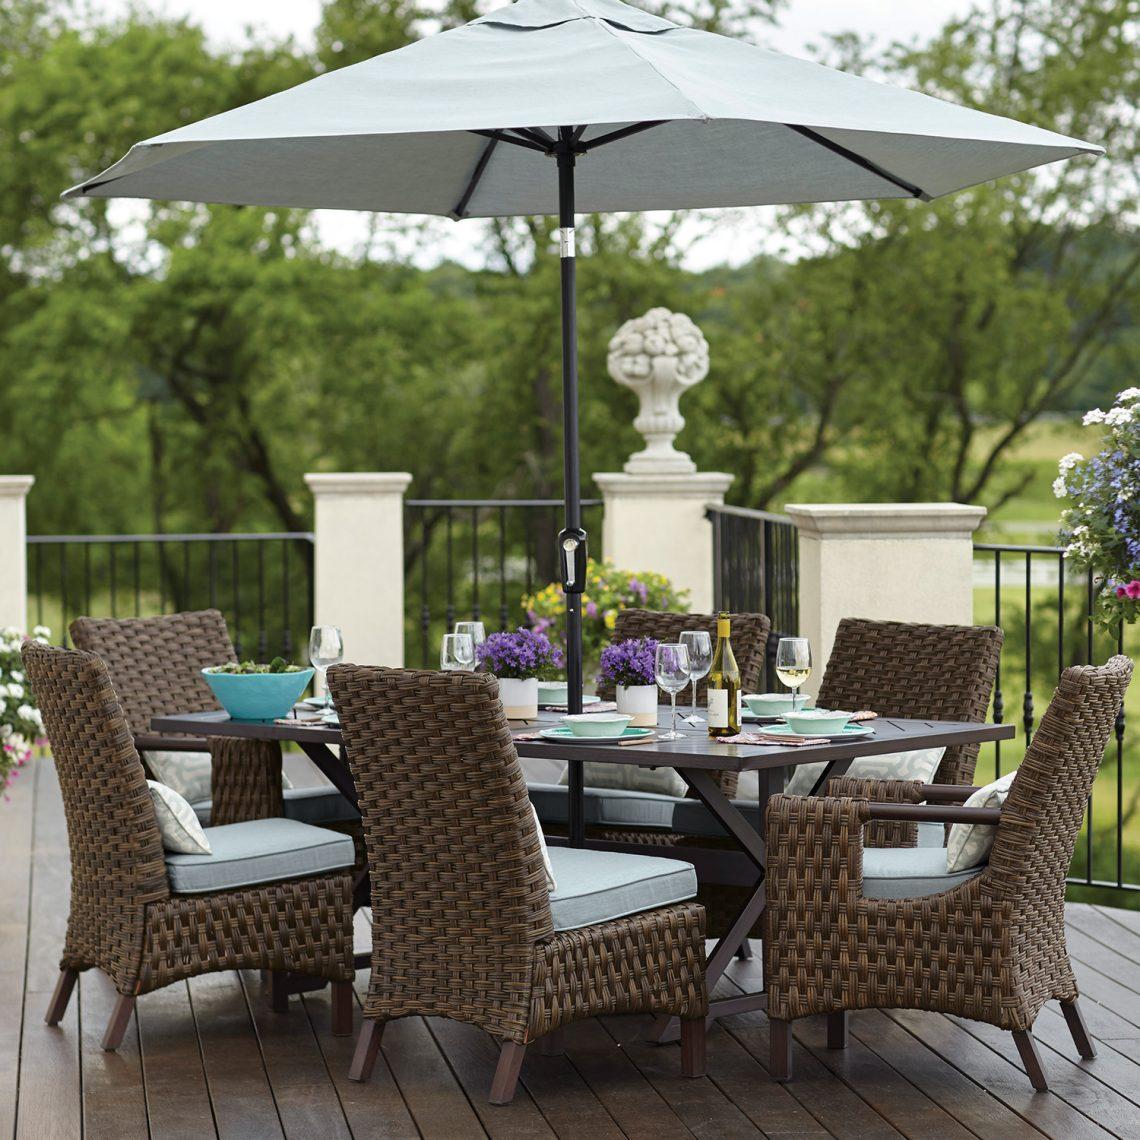 Hortons Lighting Lagrange Il: Outdoor Furniture La Grange